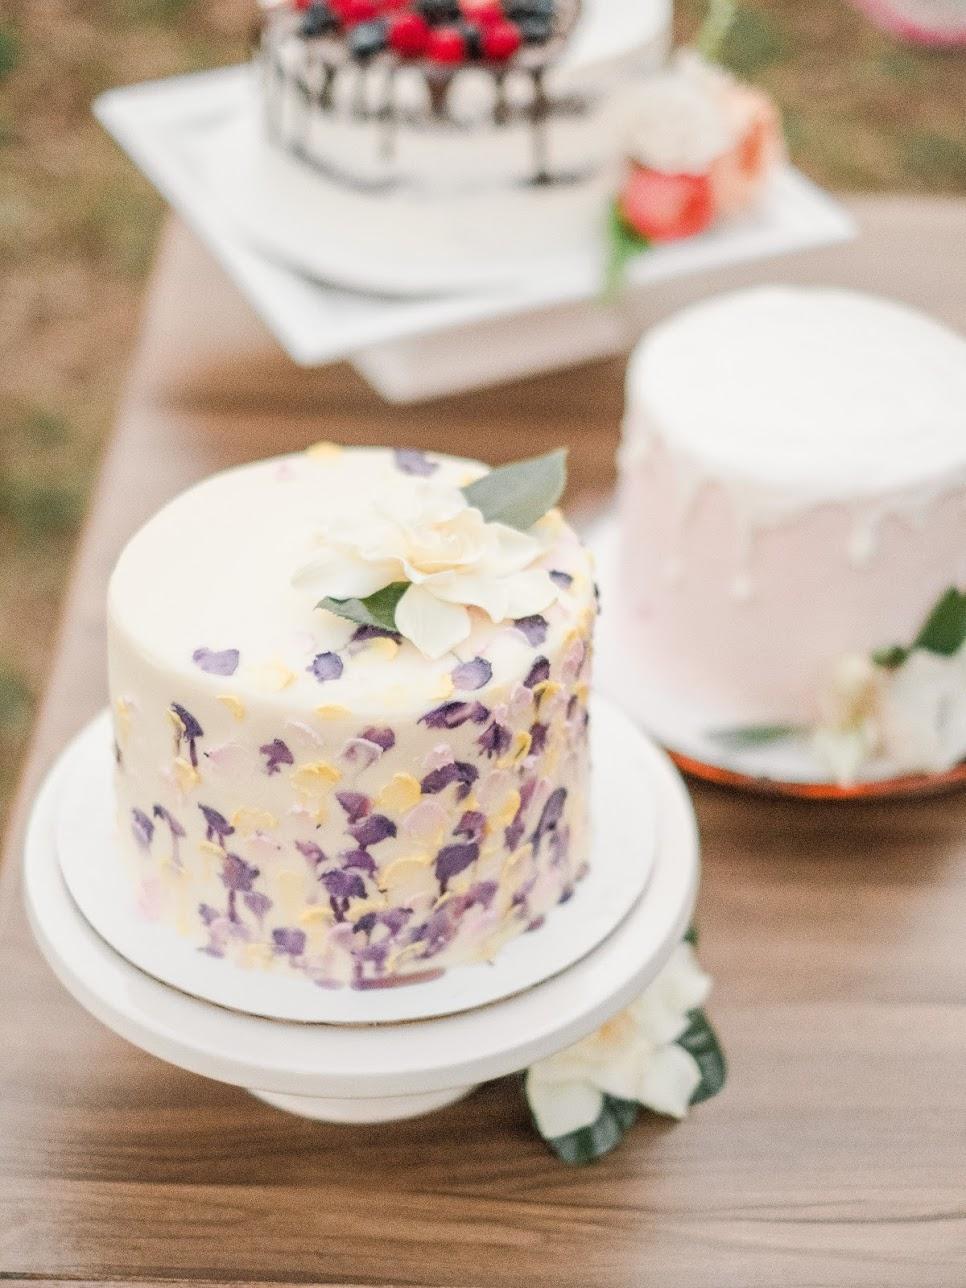 Aly Carroll - Molly's Cupcakes 4.jpg